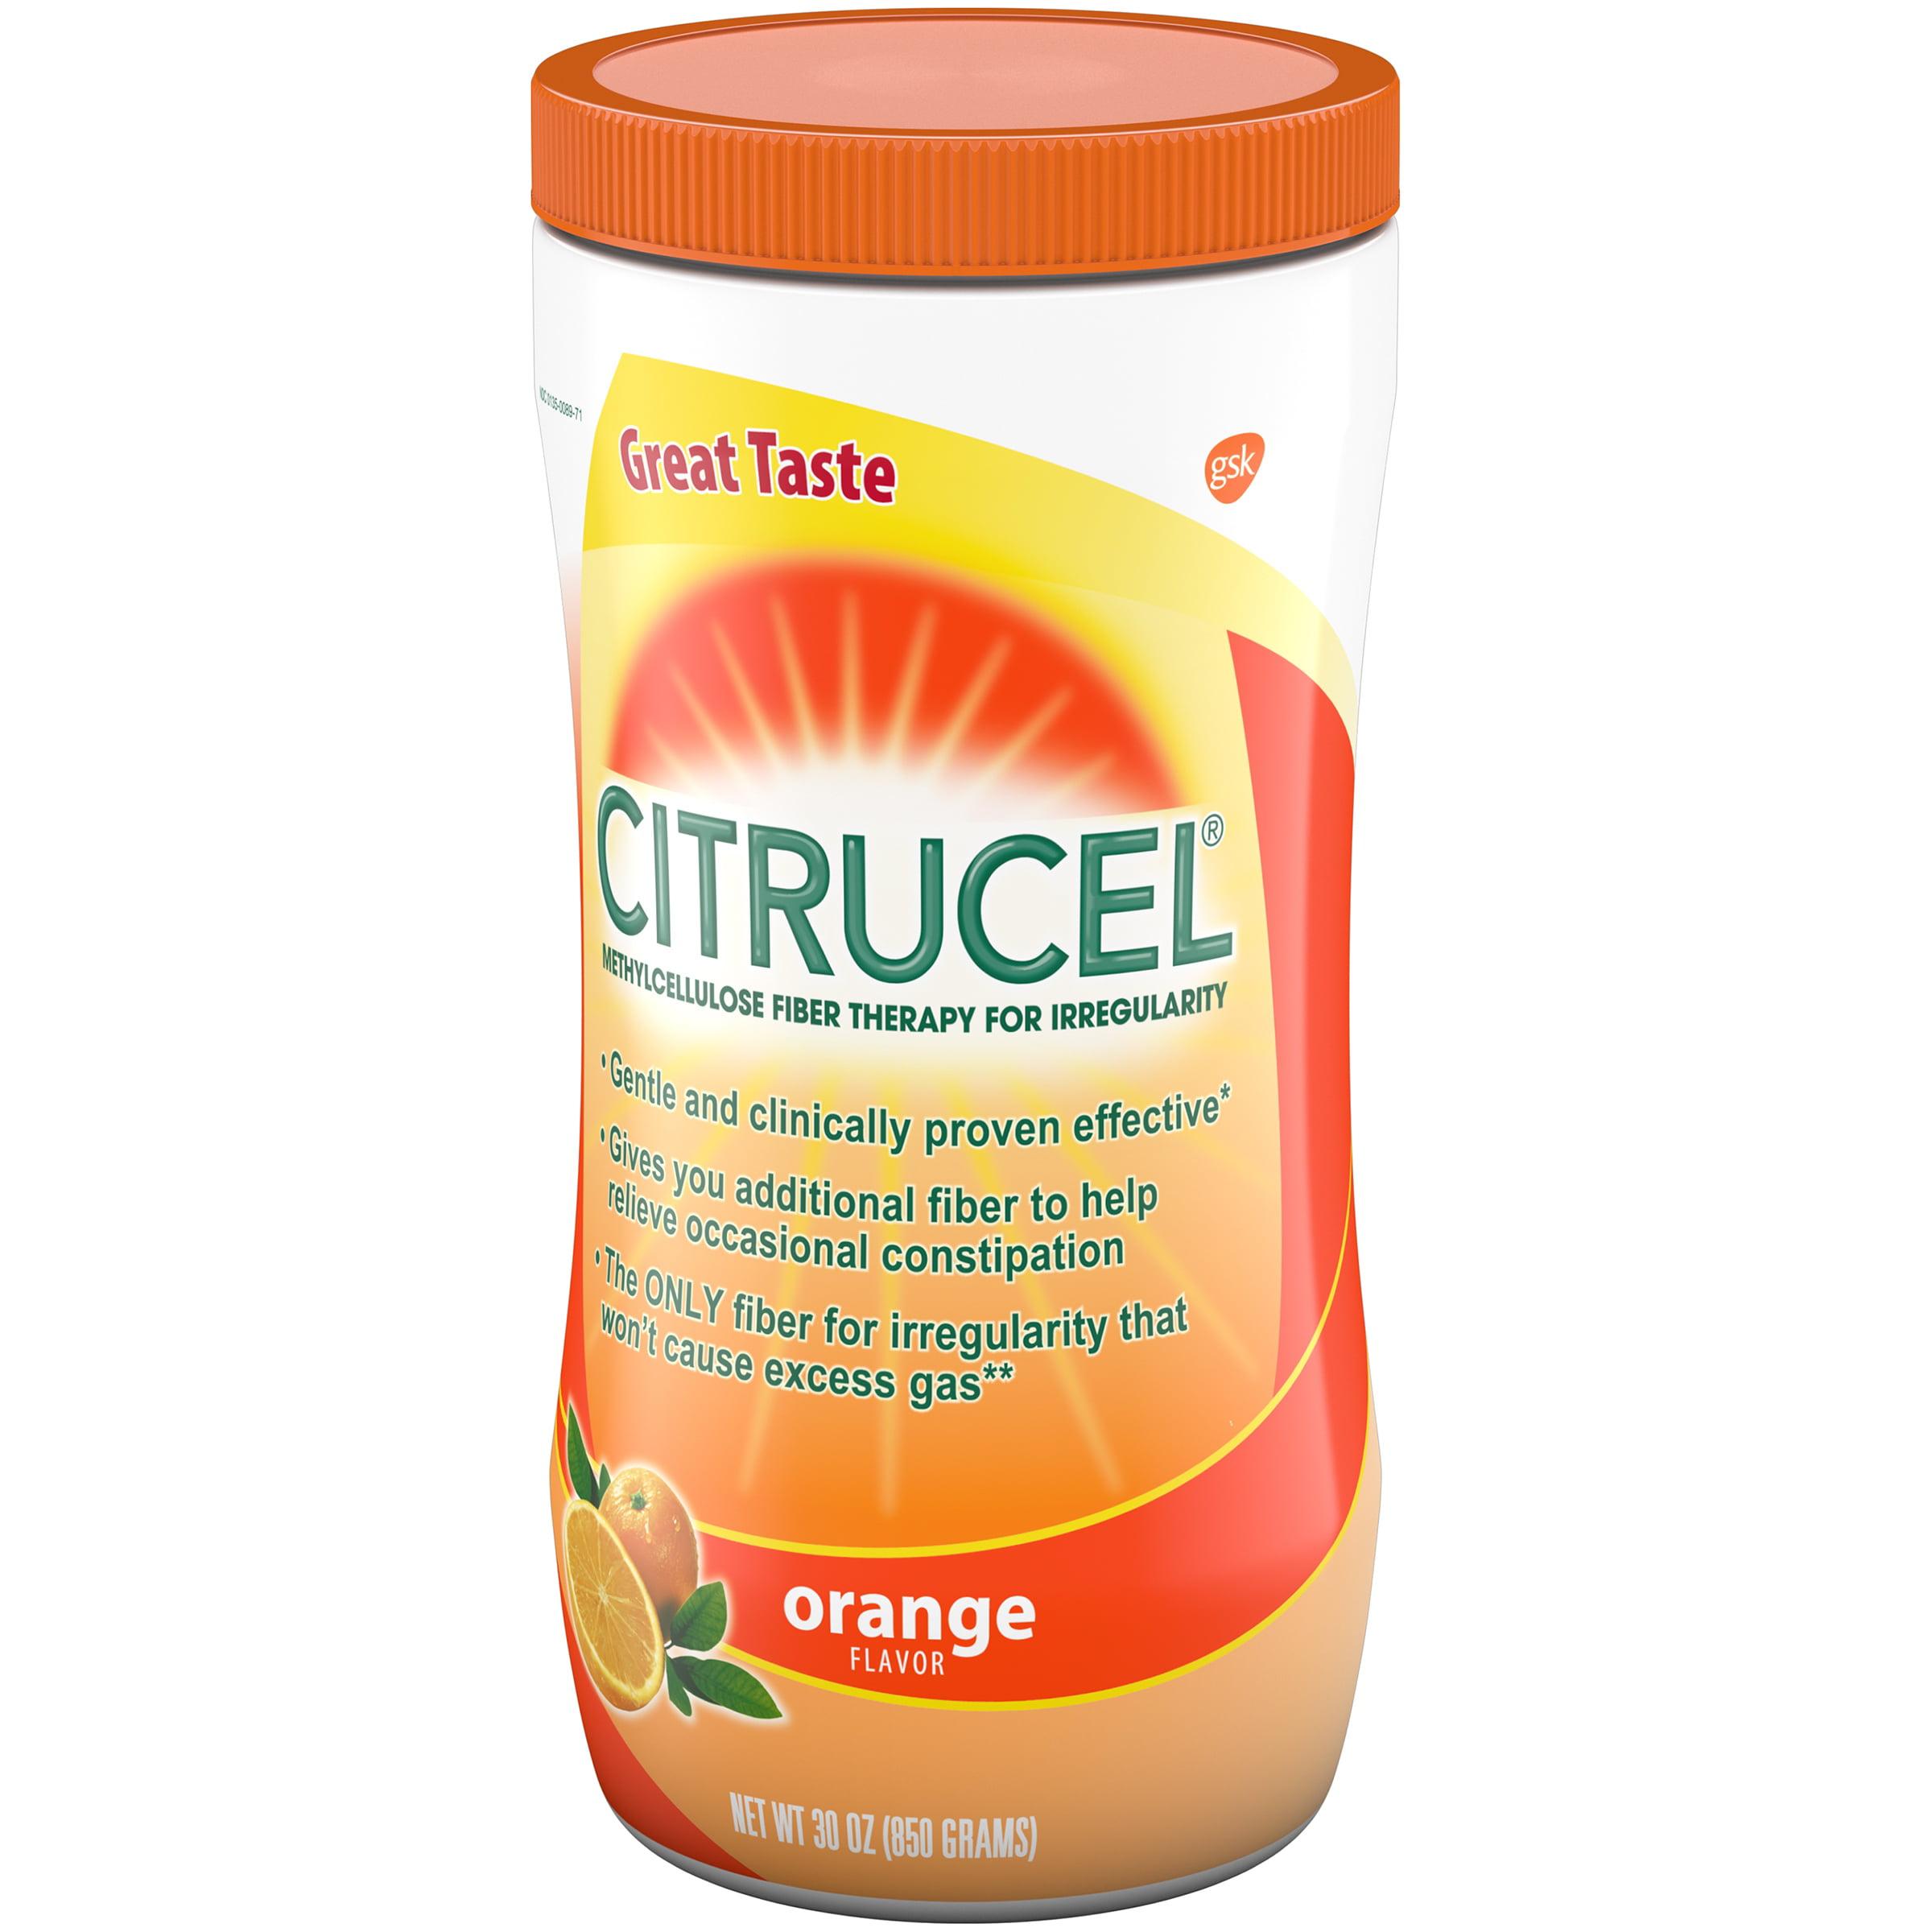 Citrucel smart fiber nutrition facts nutrition ftempo - Five smart uses of sugar ...